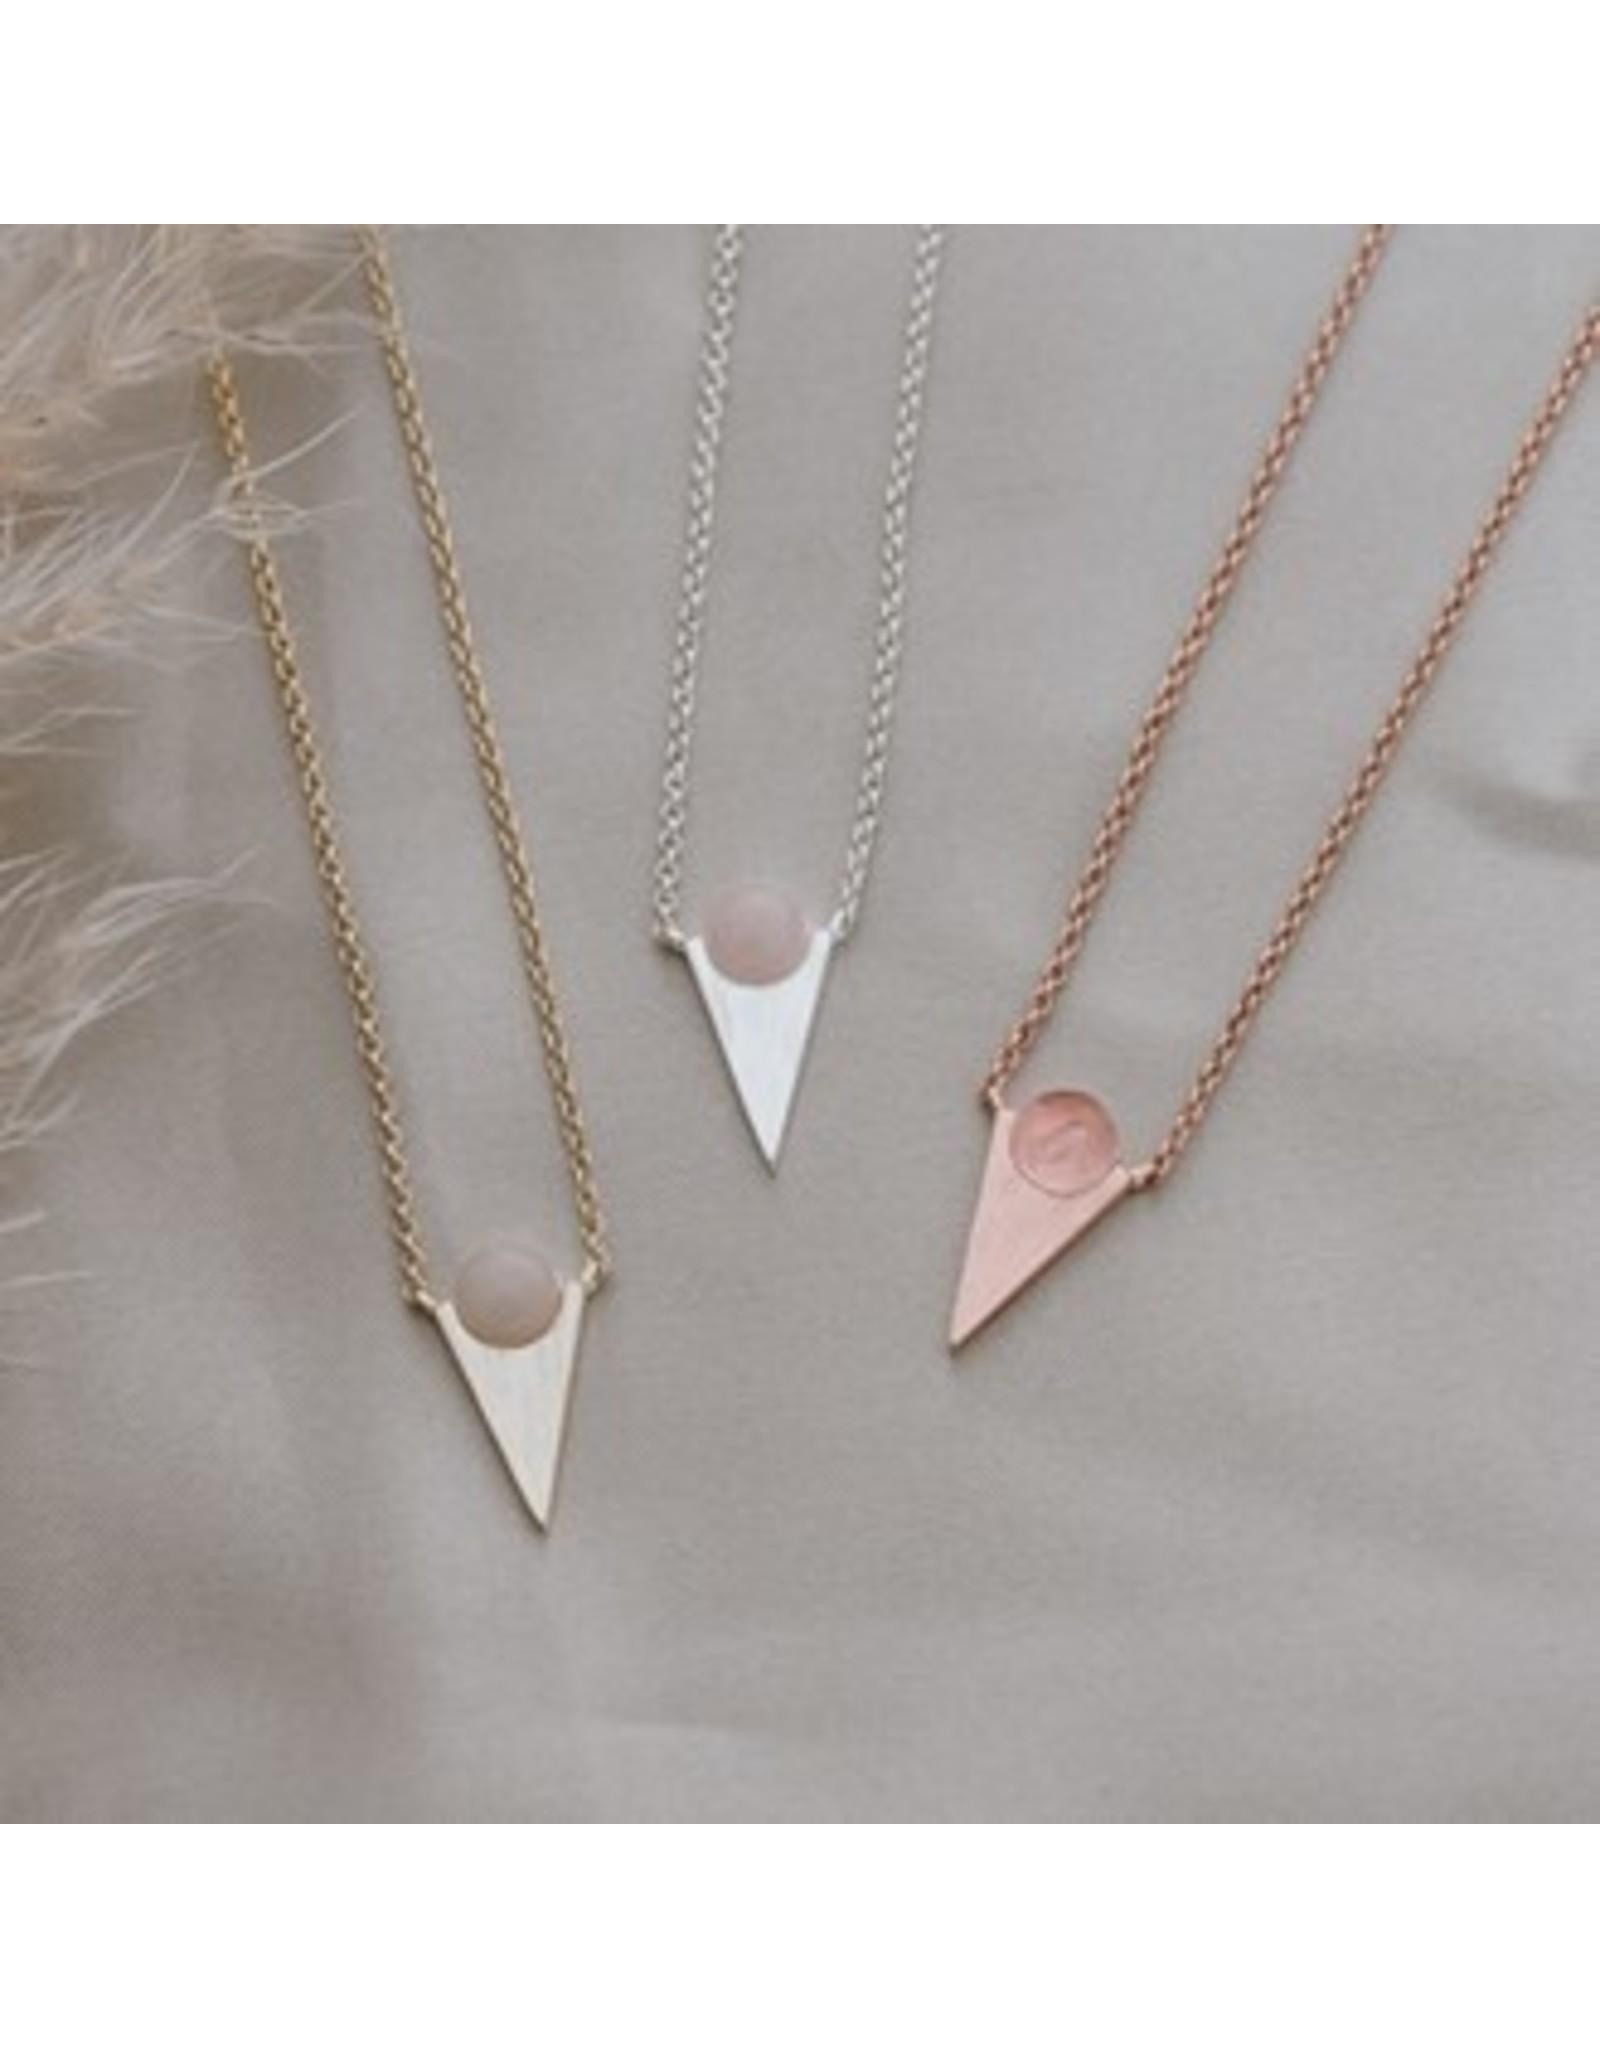 Glee jewelry Moon Child Necklace/Rose Quartz/Silver